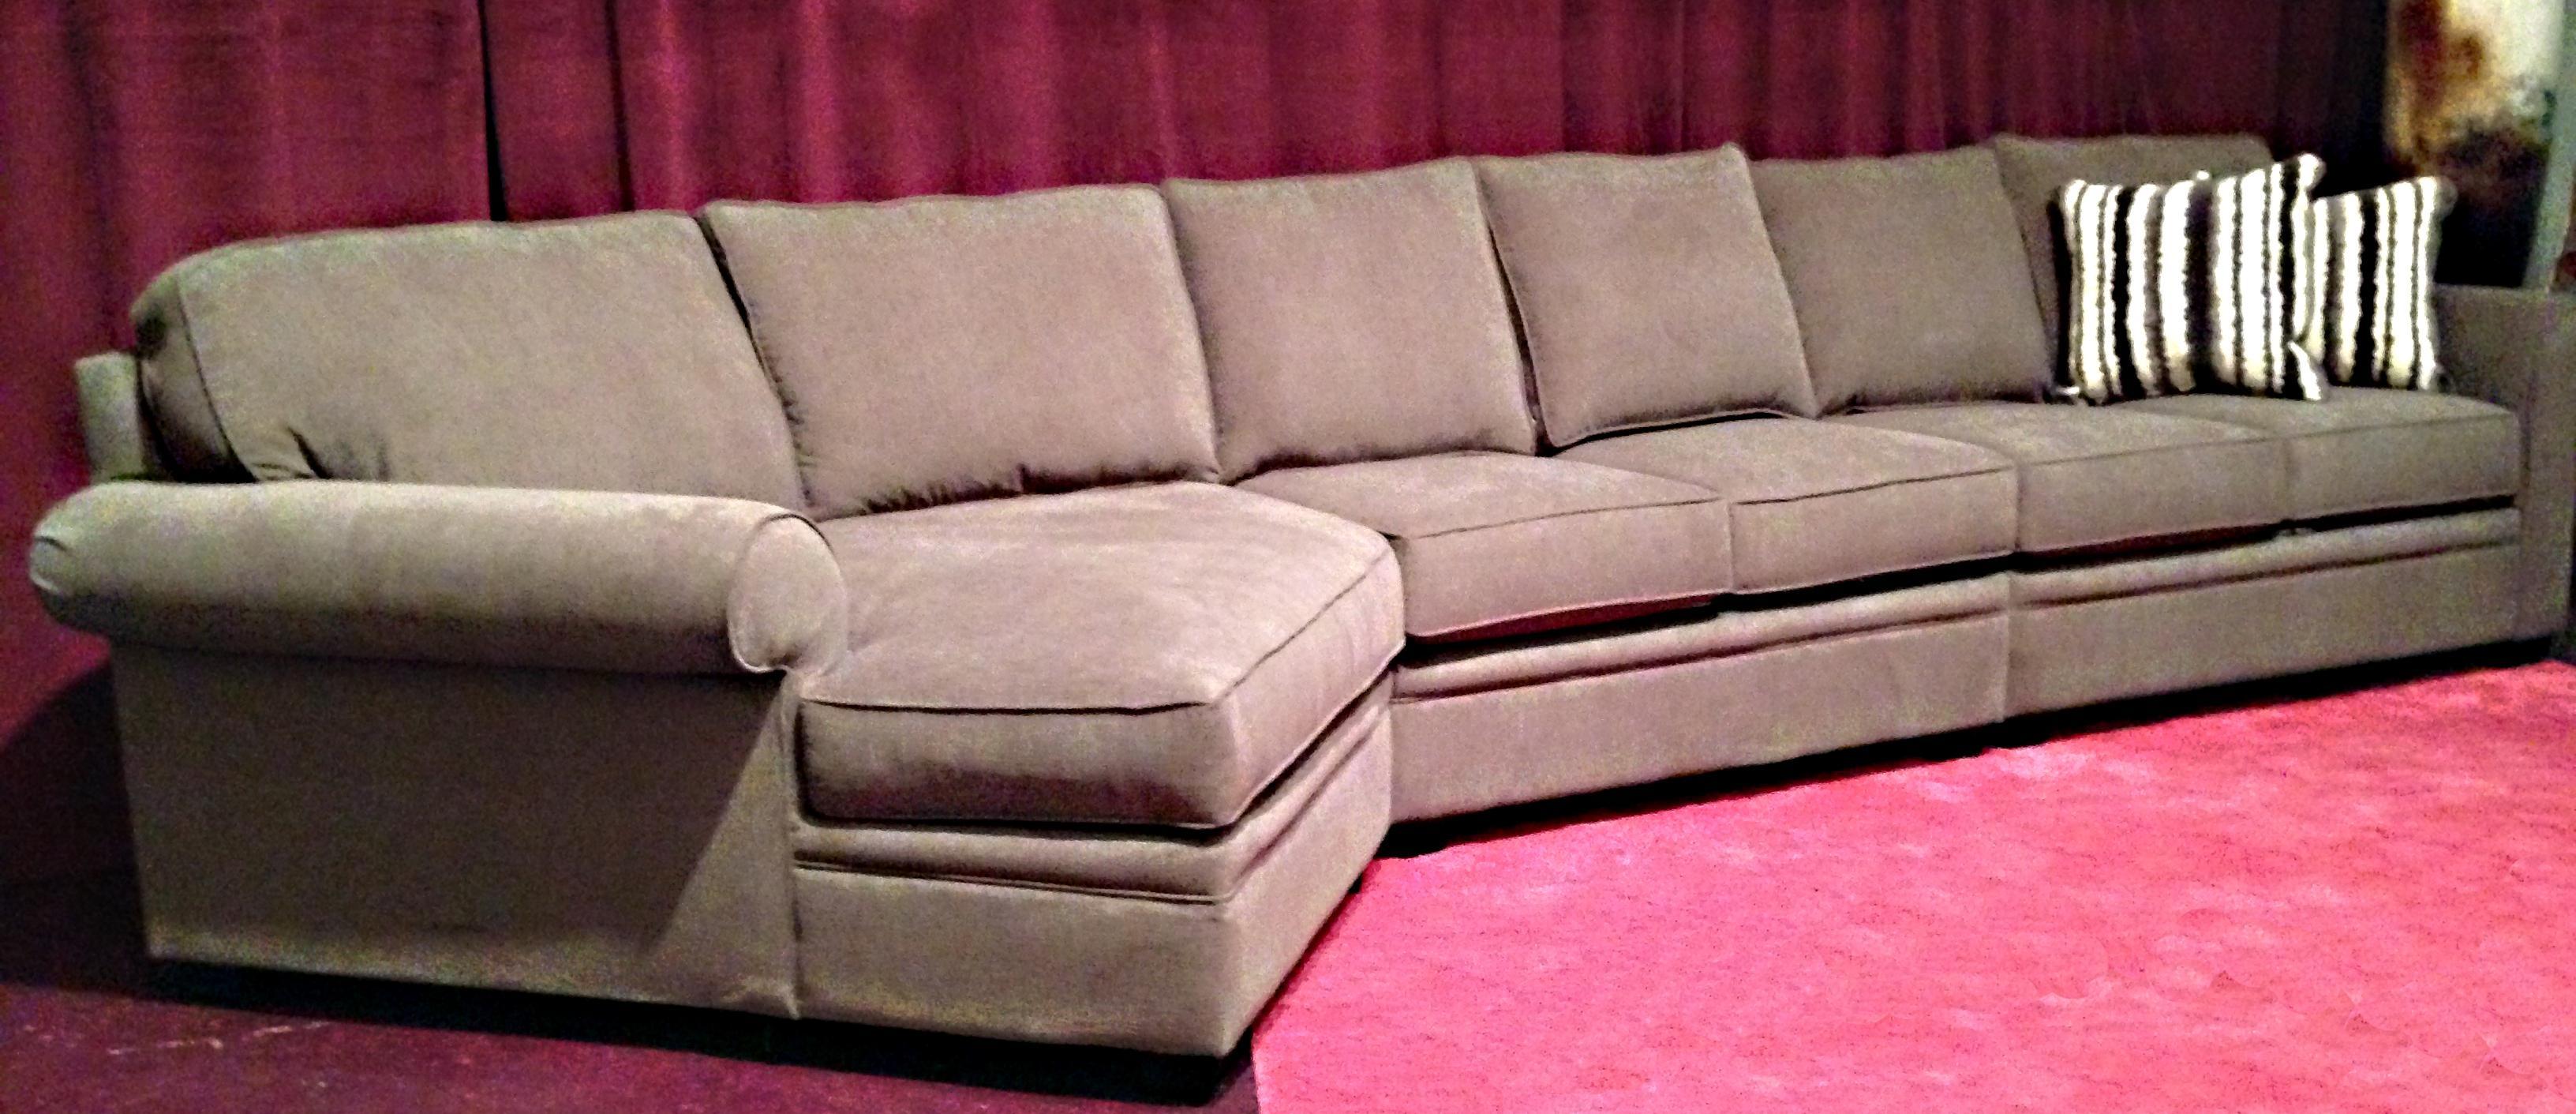 One Cushion Sofa Canada   Cushions Decoration In Deep Cushion Sofa (Image 13 of 20)